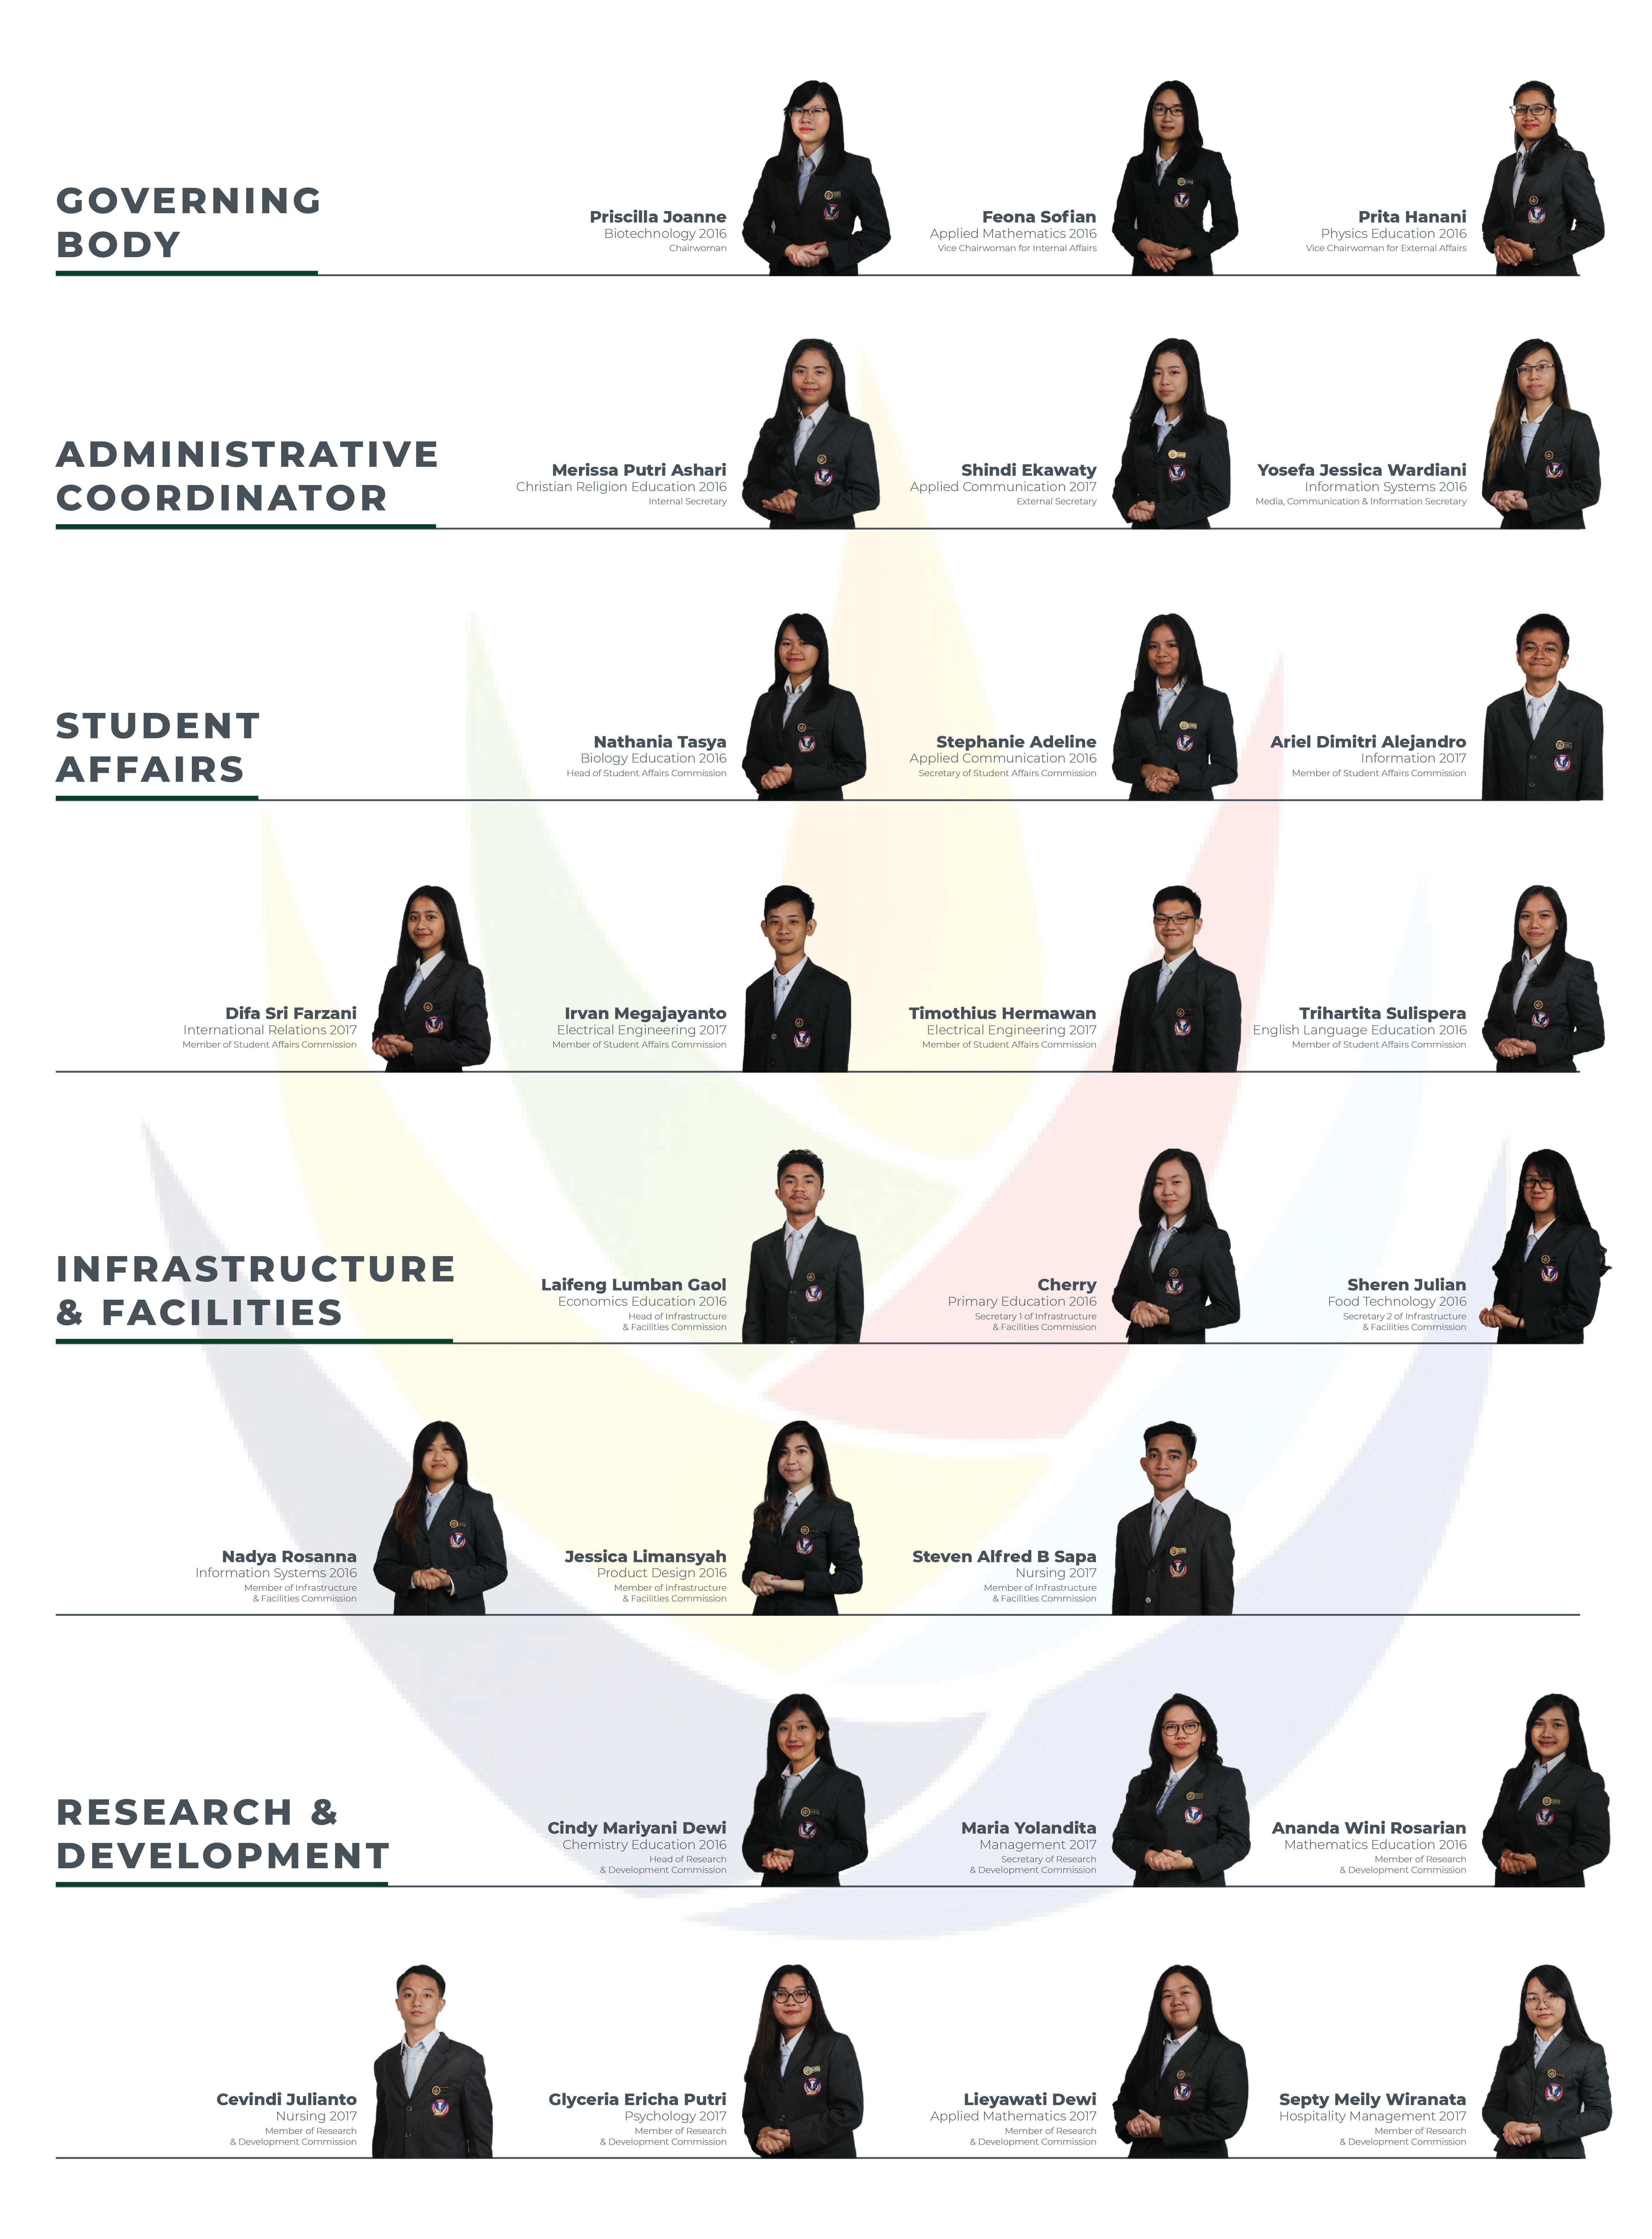 Majelis Perwakilan Mahasiswa (MPM)